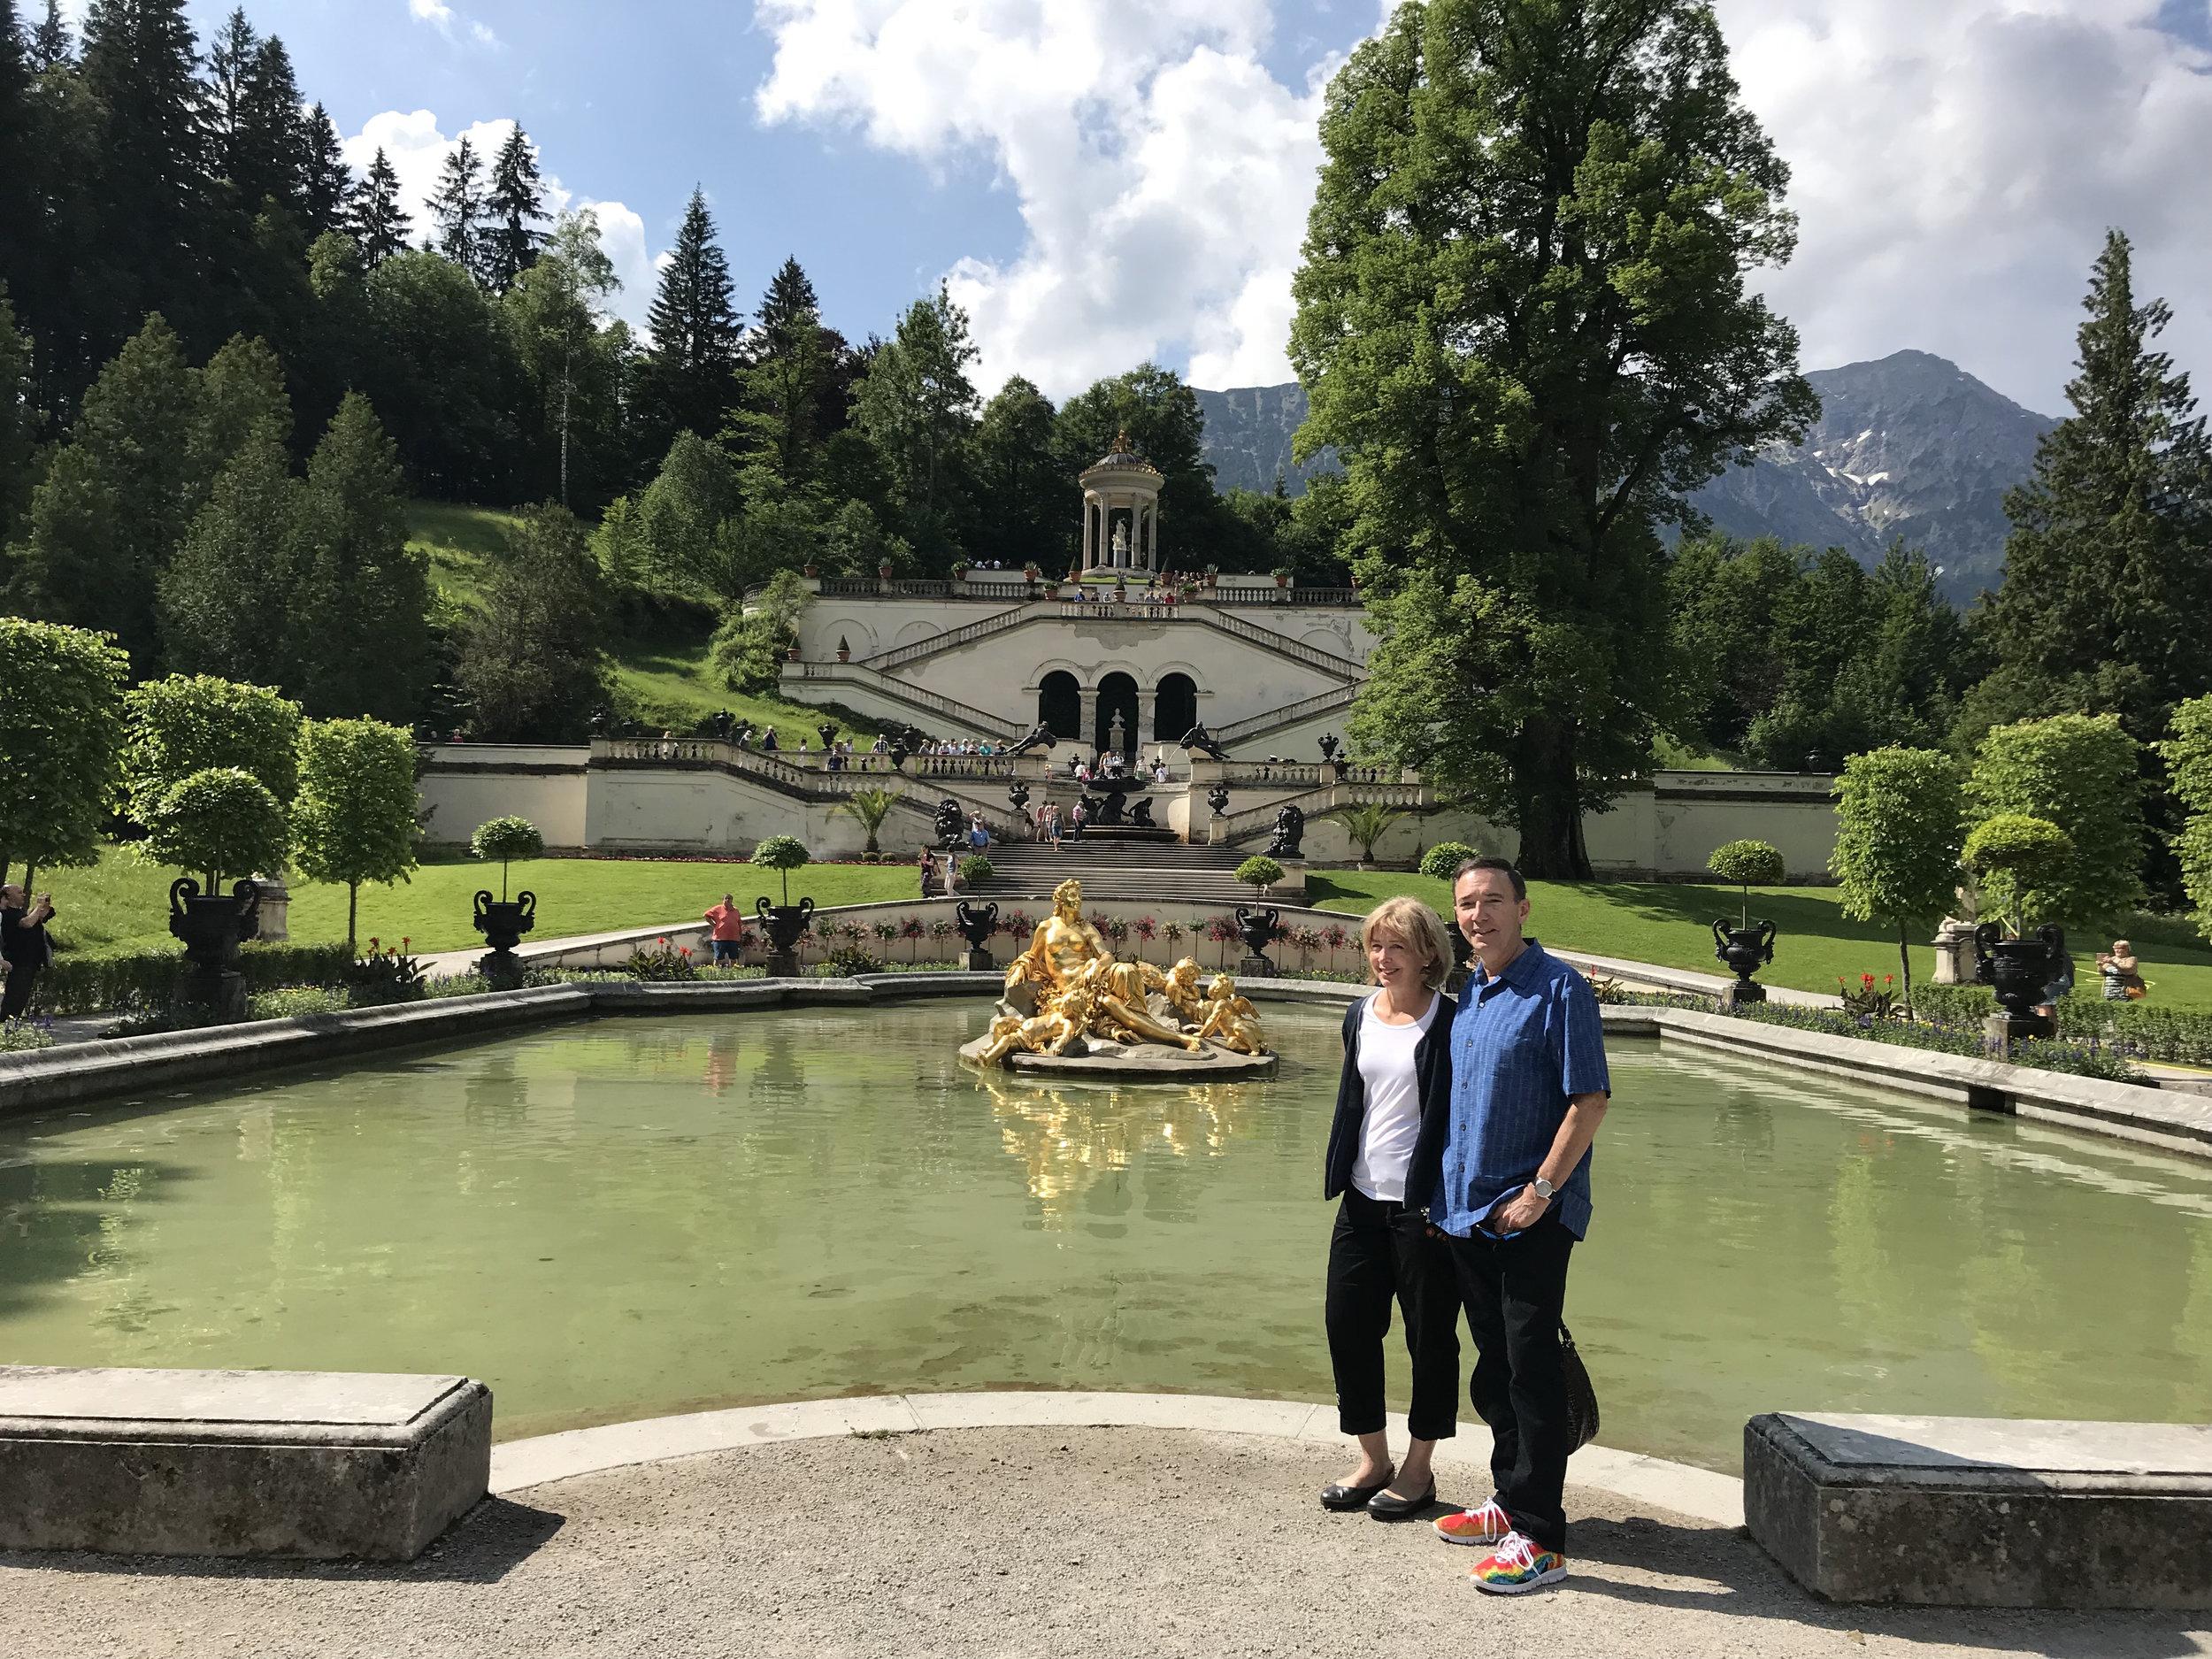 Teri_Day2_Castles_Germany&Austria_spiritedtable_photo45.jpg